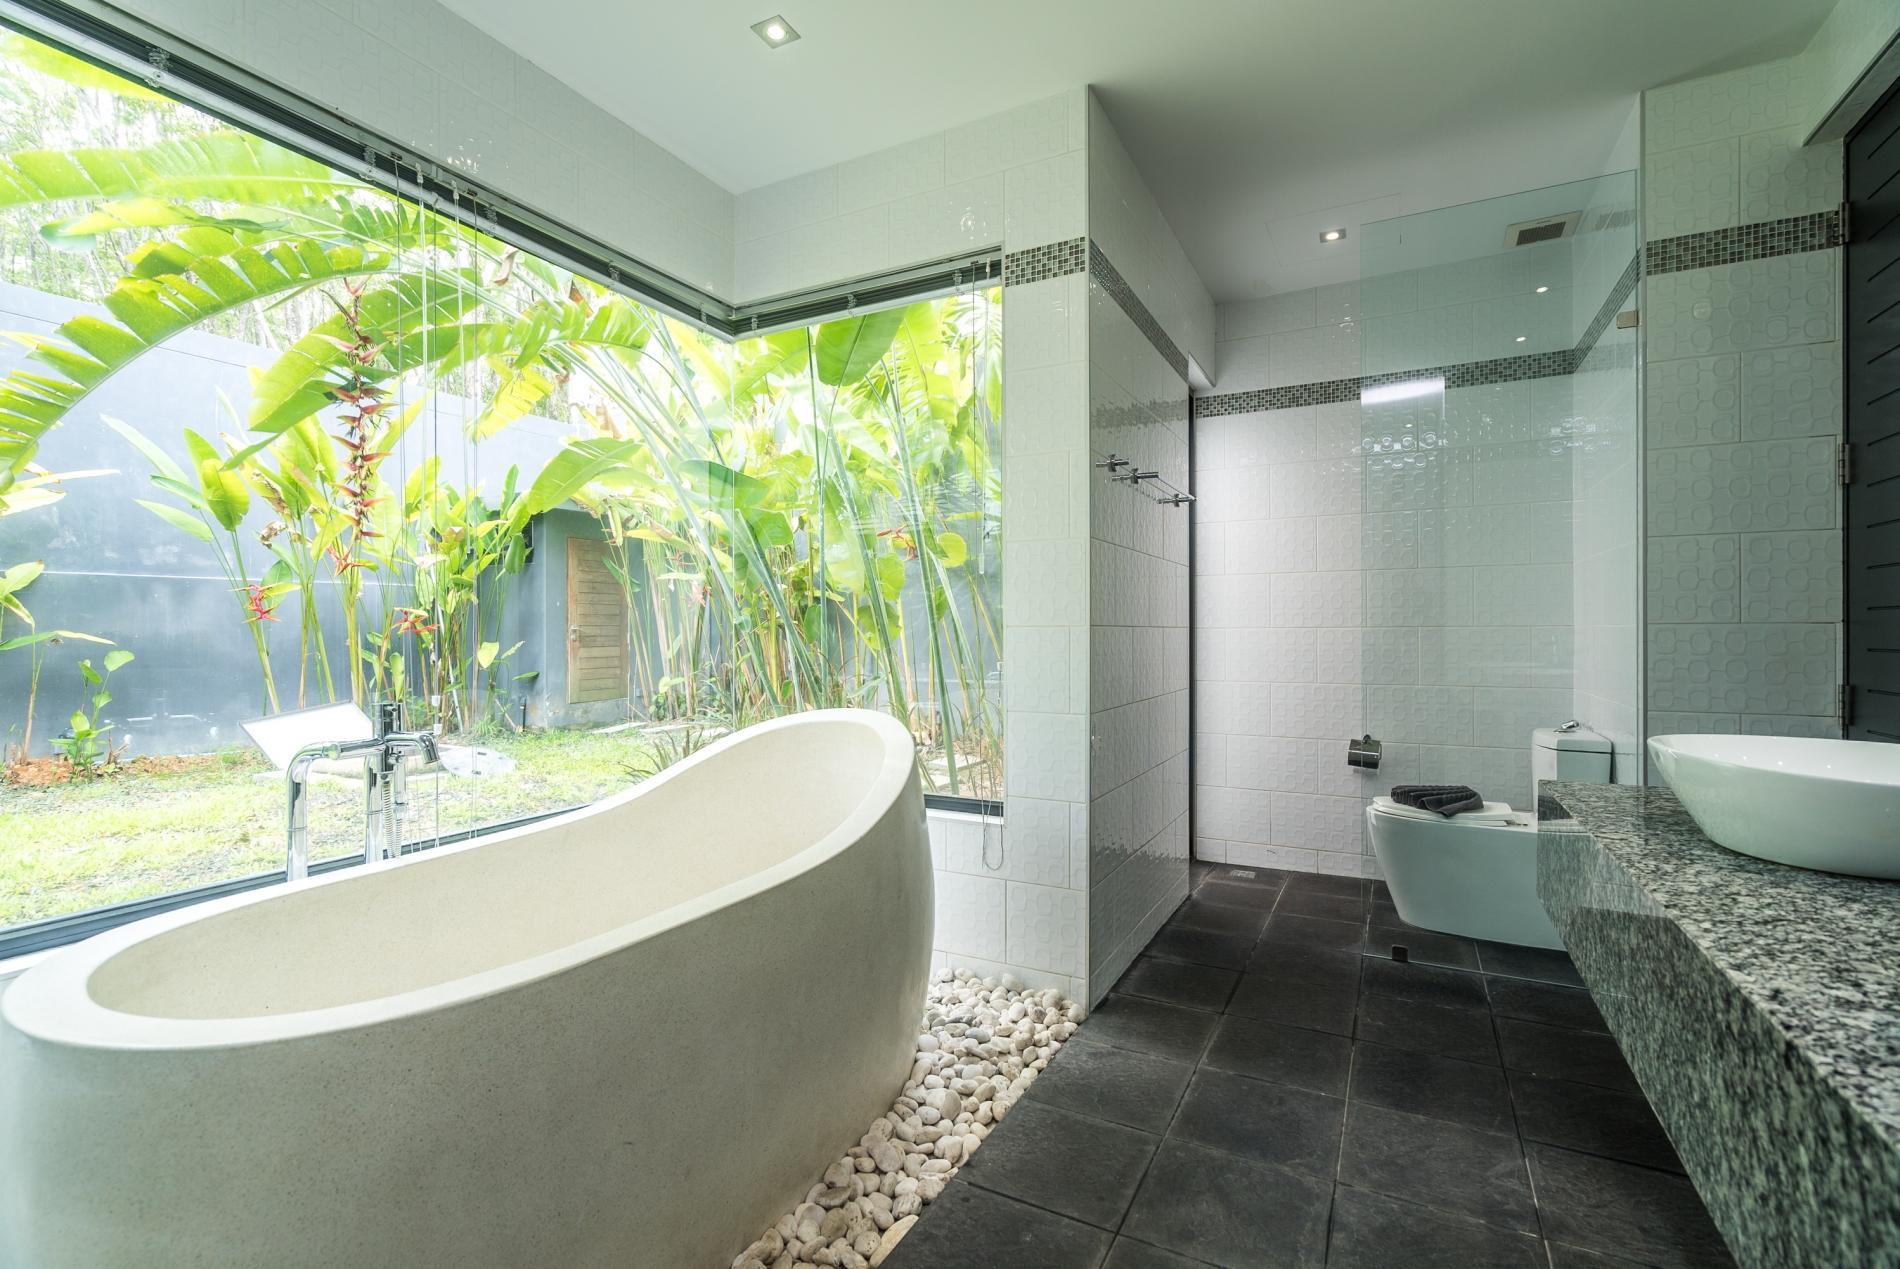 Apartment Diamond 272 - Modern 4 br private pool and garden villa photo 20320646